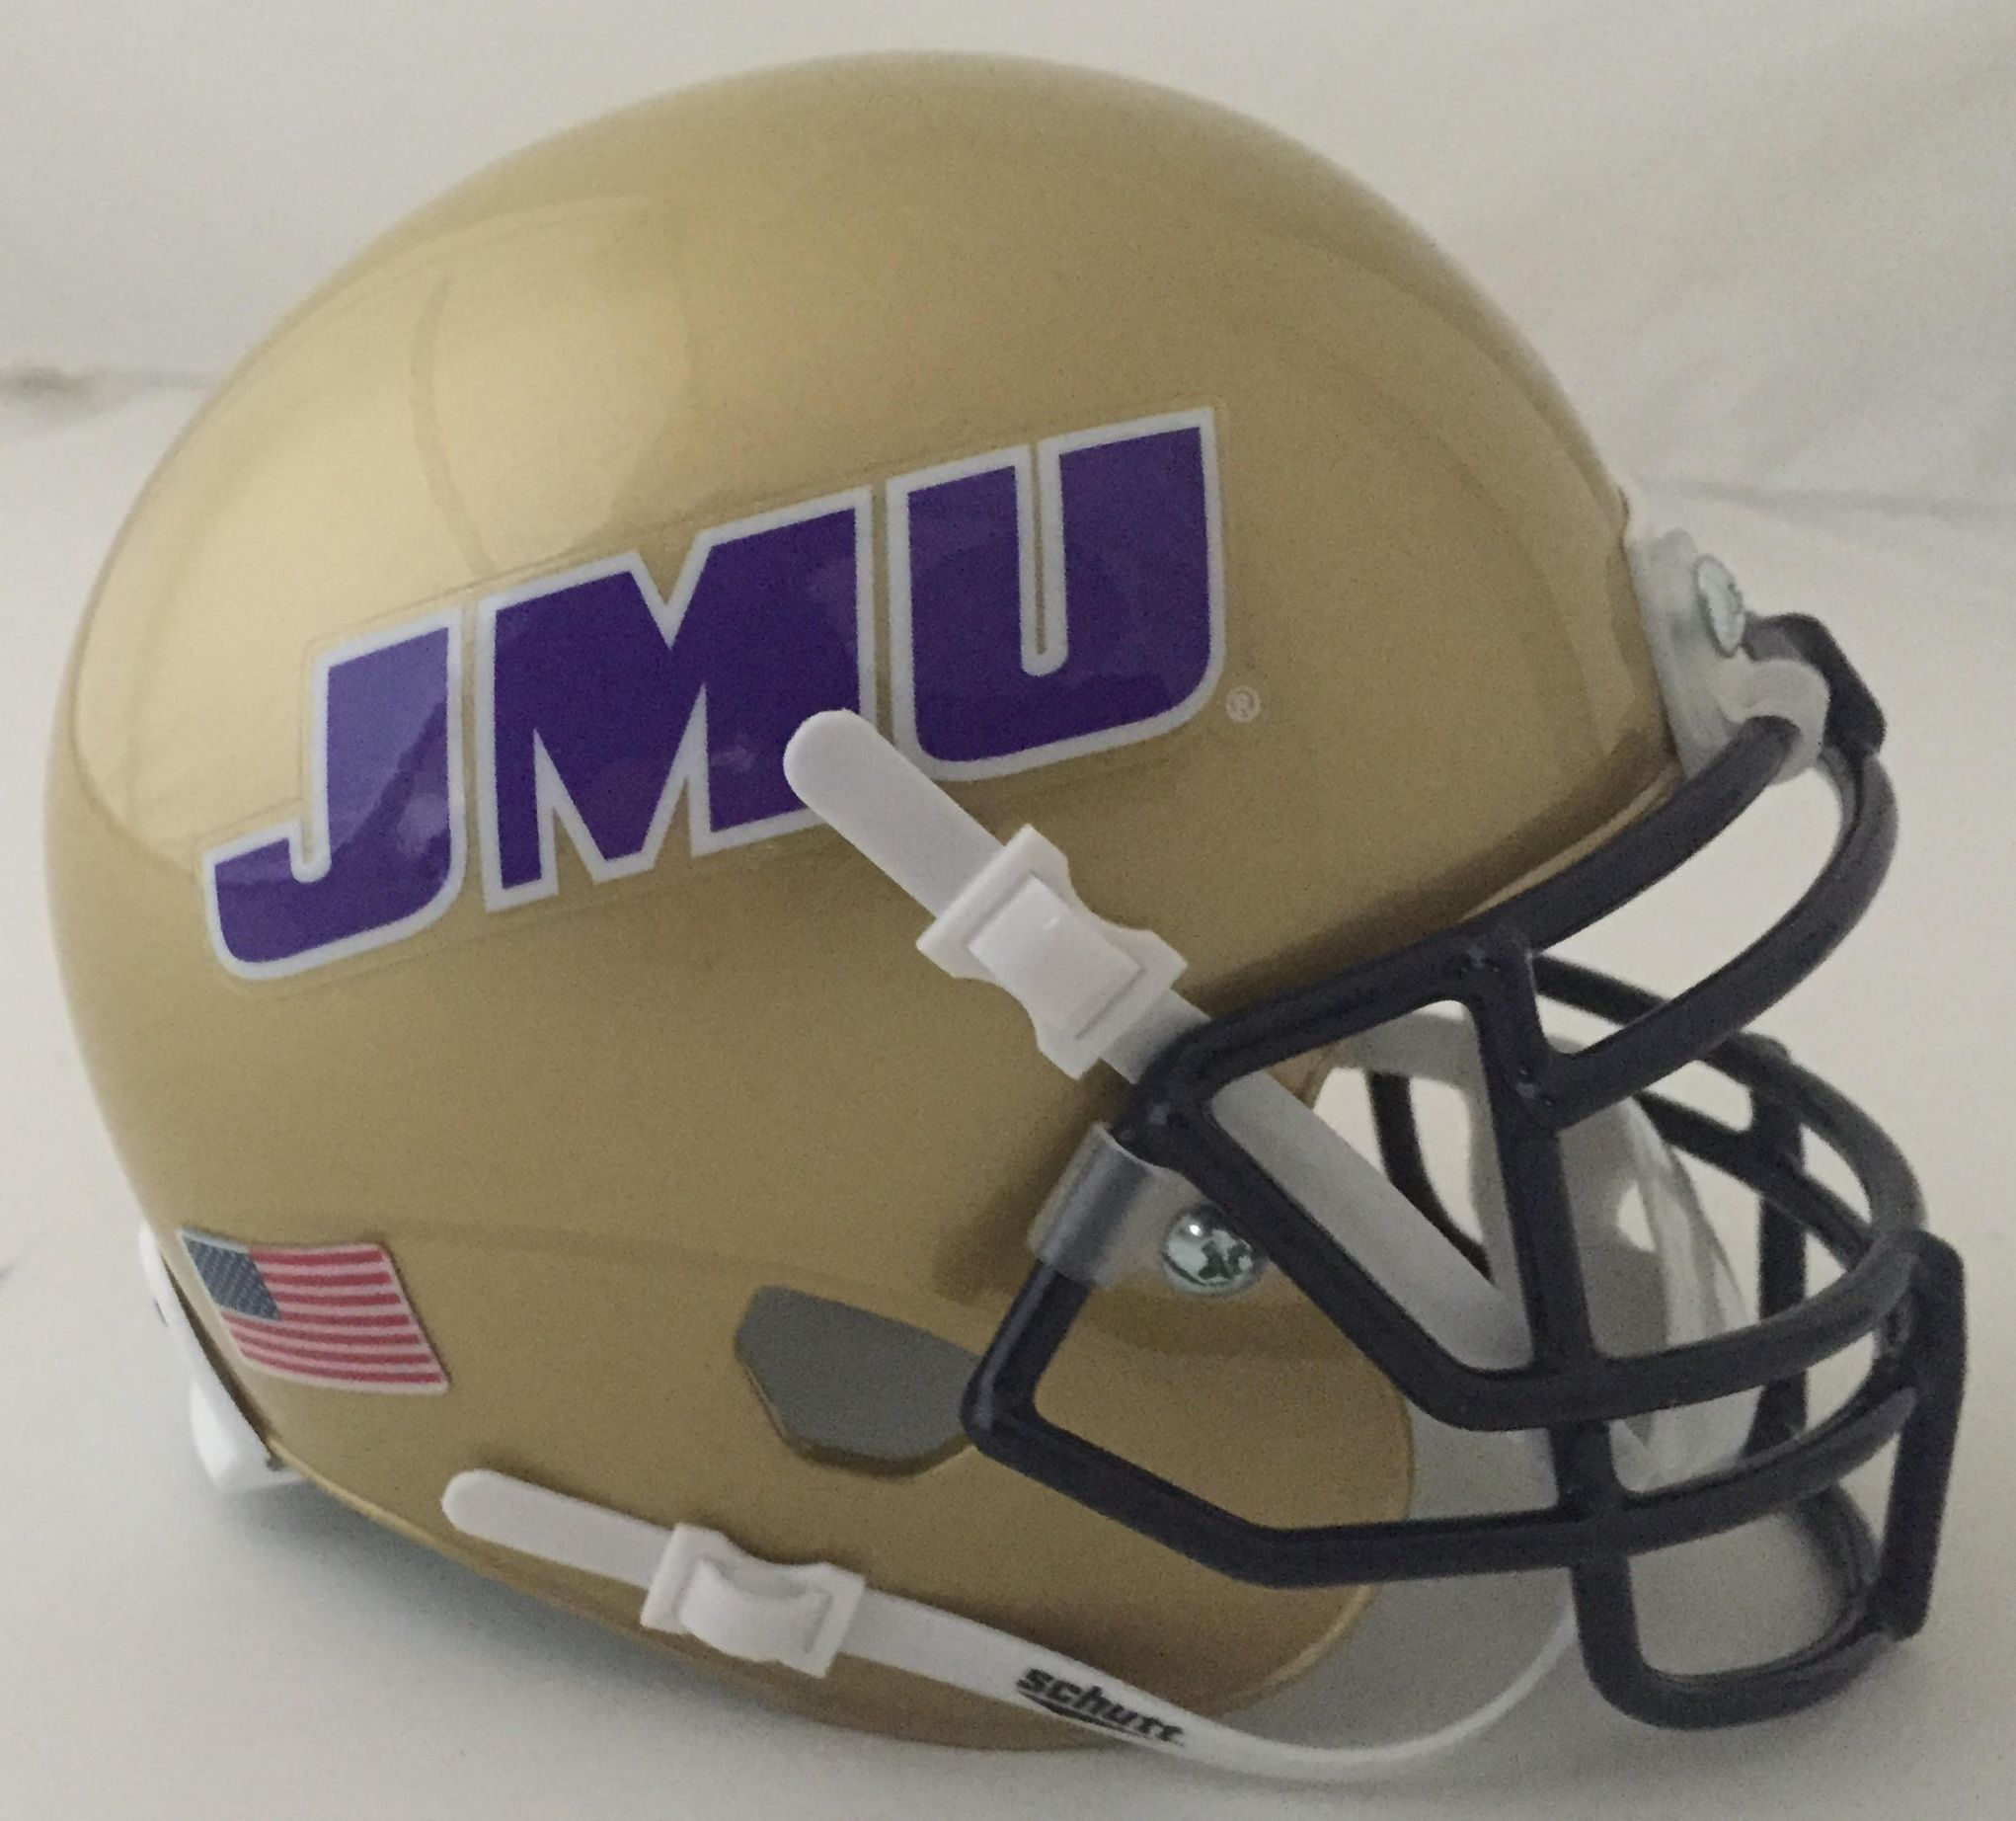 James madison dukes schutt xp mini helmet football